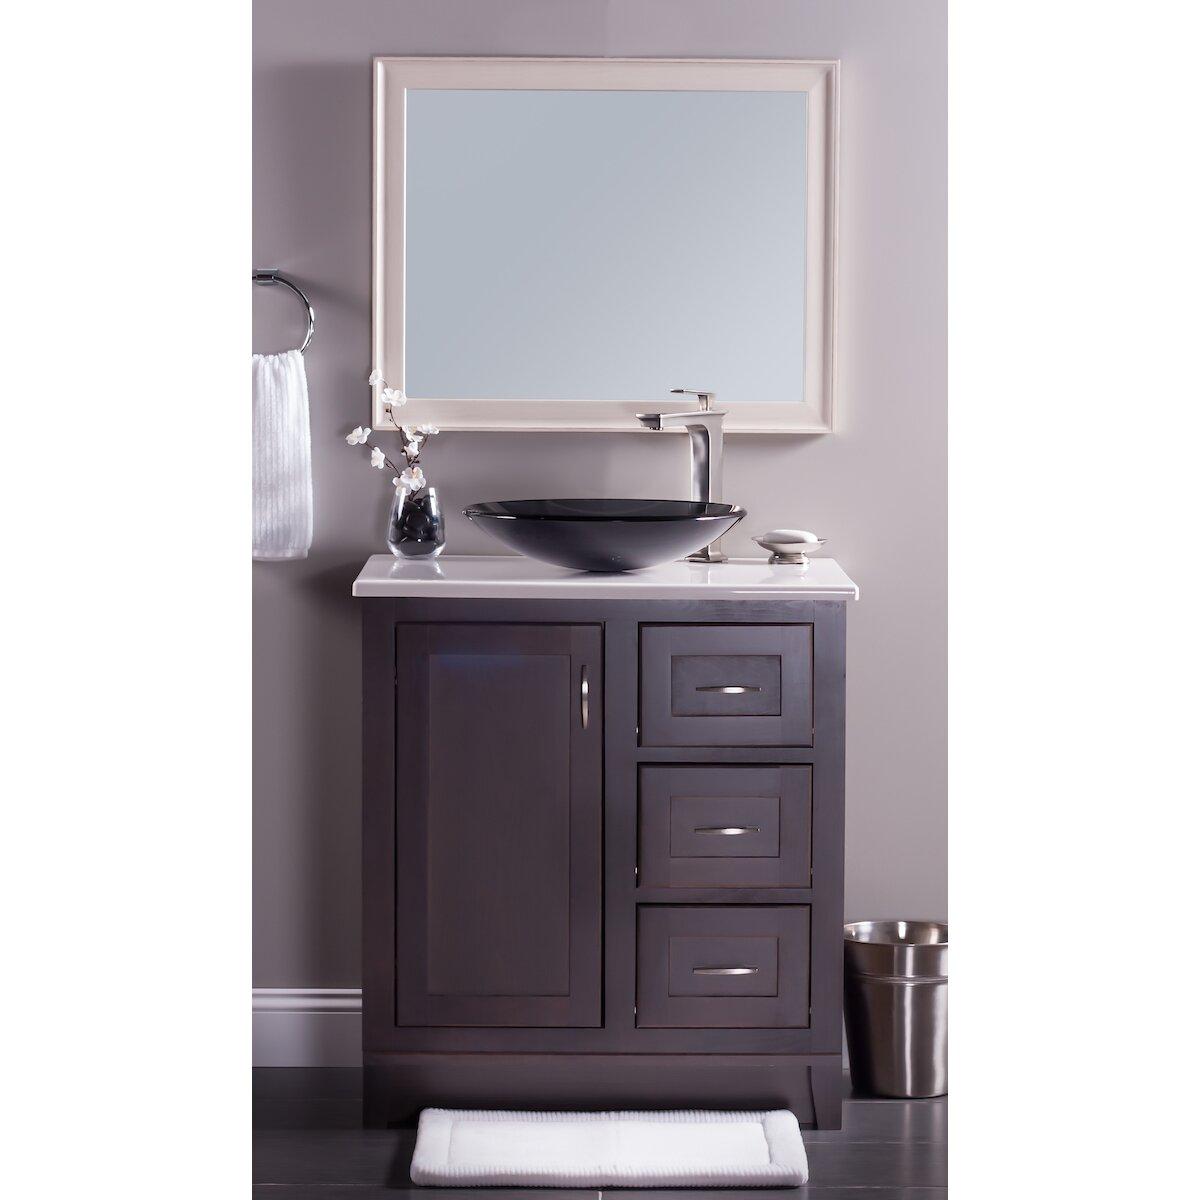 novatto low profile glass vessel bathroom sink reviews